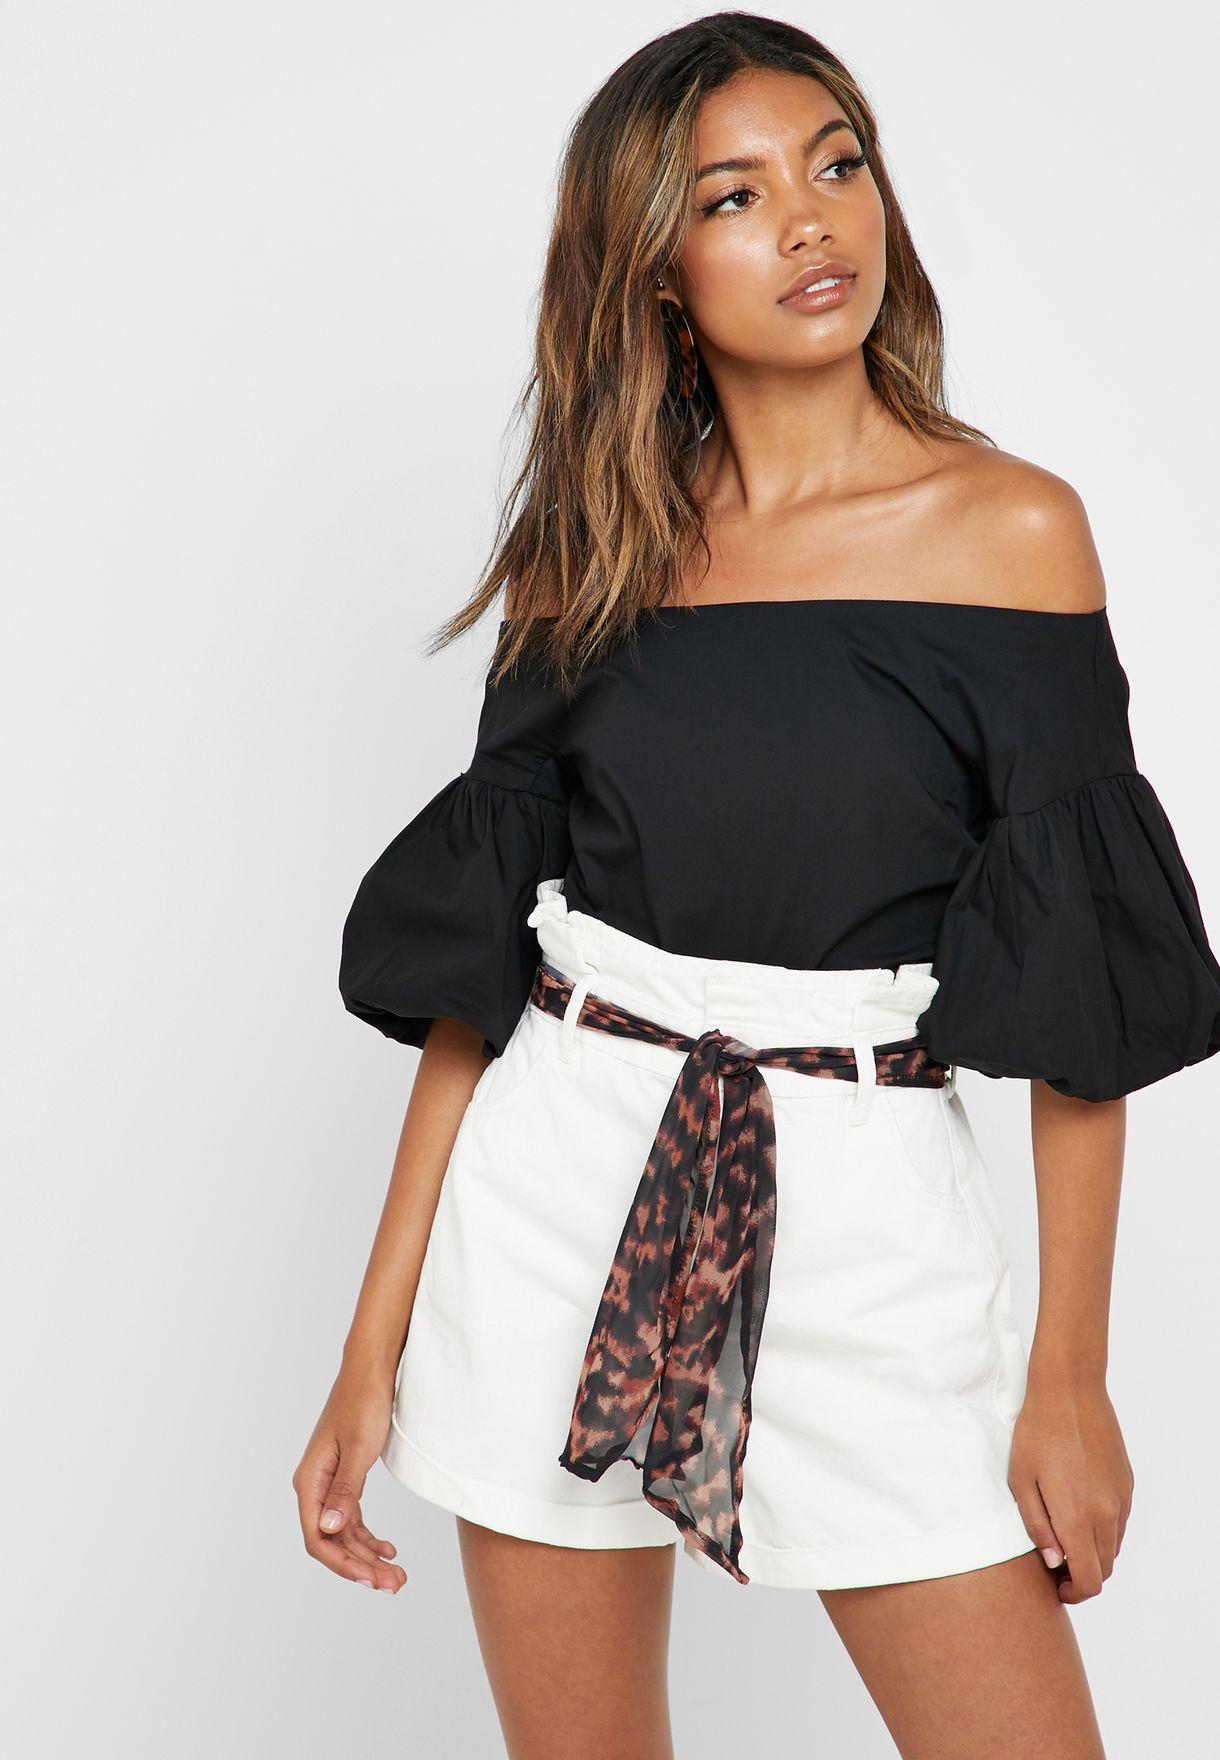 286a6eab227 Shop Topshop black Puff Sleeve Bardot Top 13O12QBLK for Women in ...